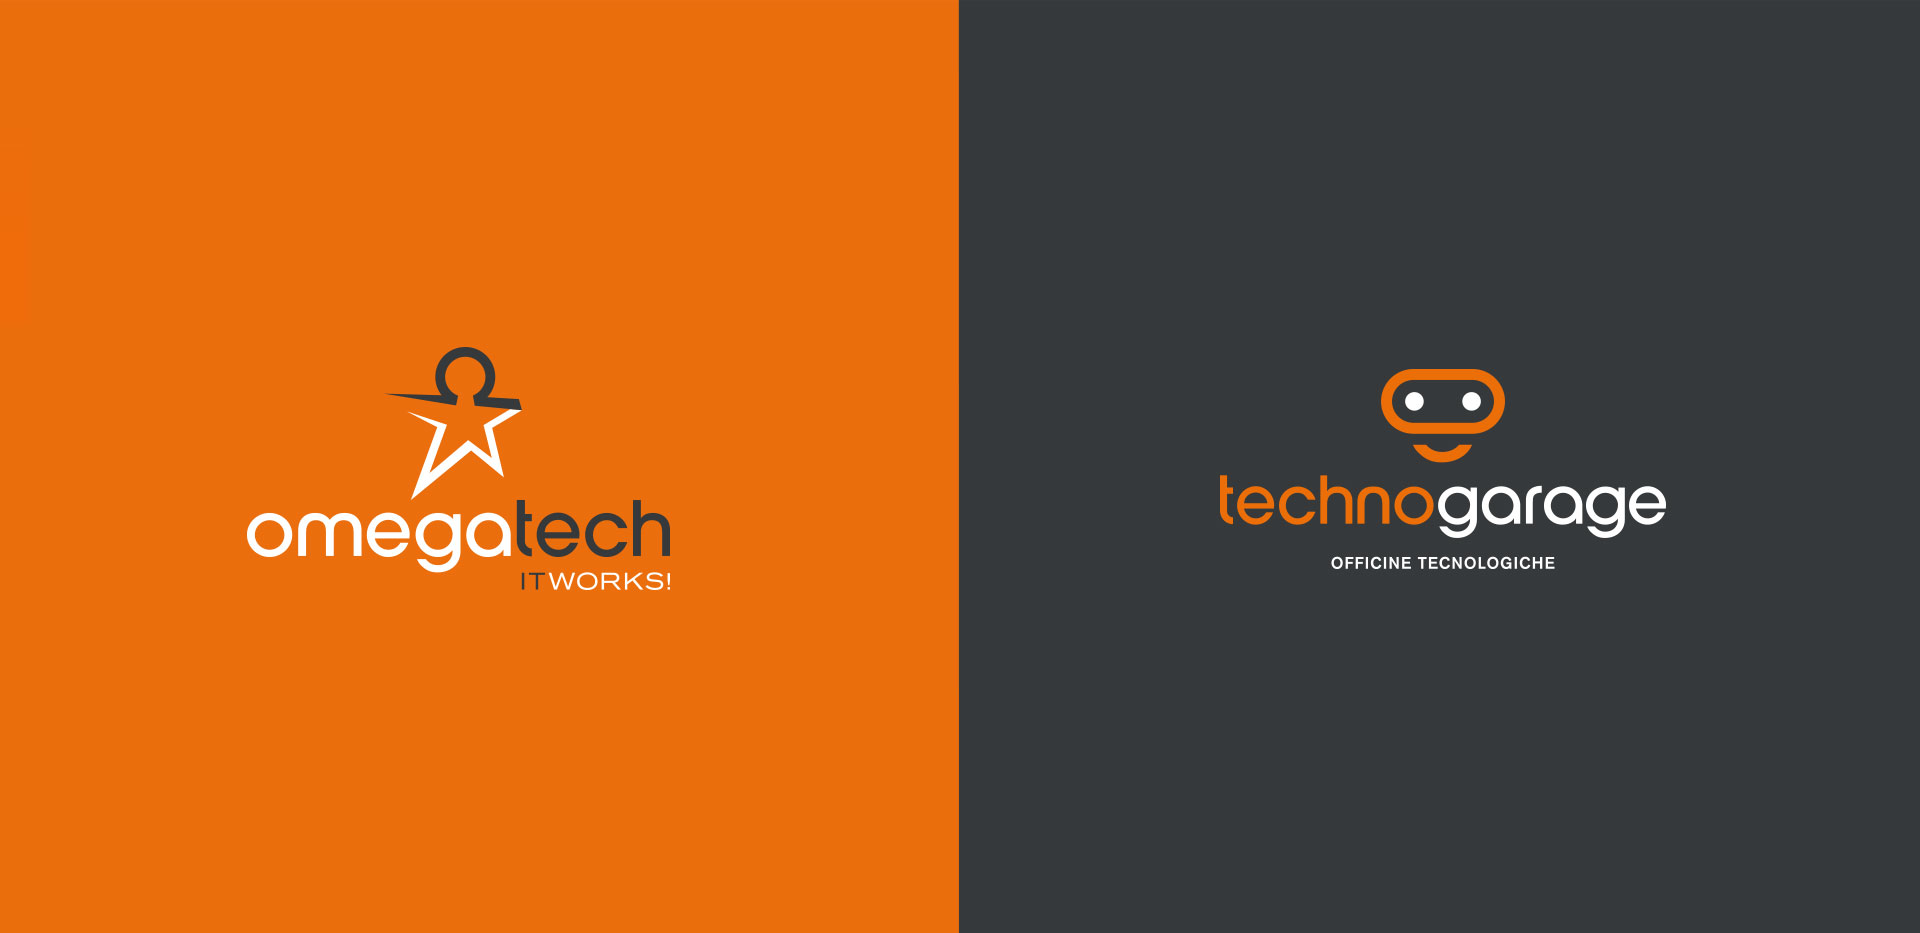 omegatech-technogarage-zerouno-design-logos